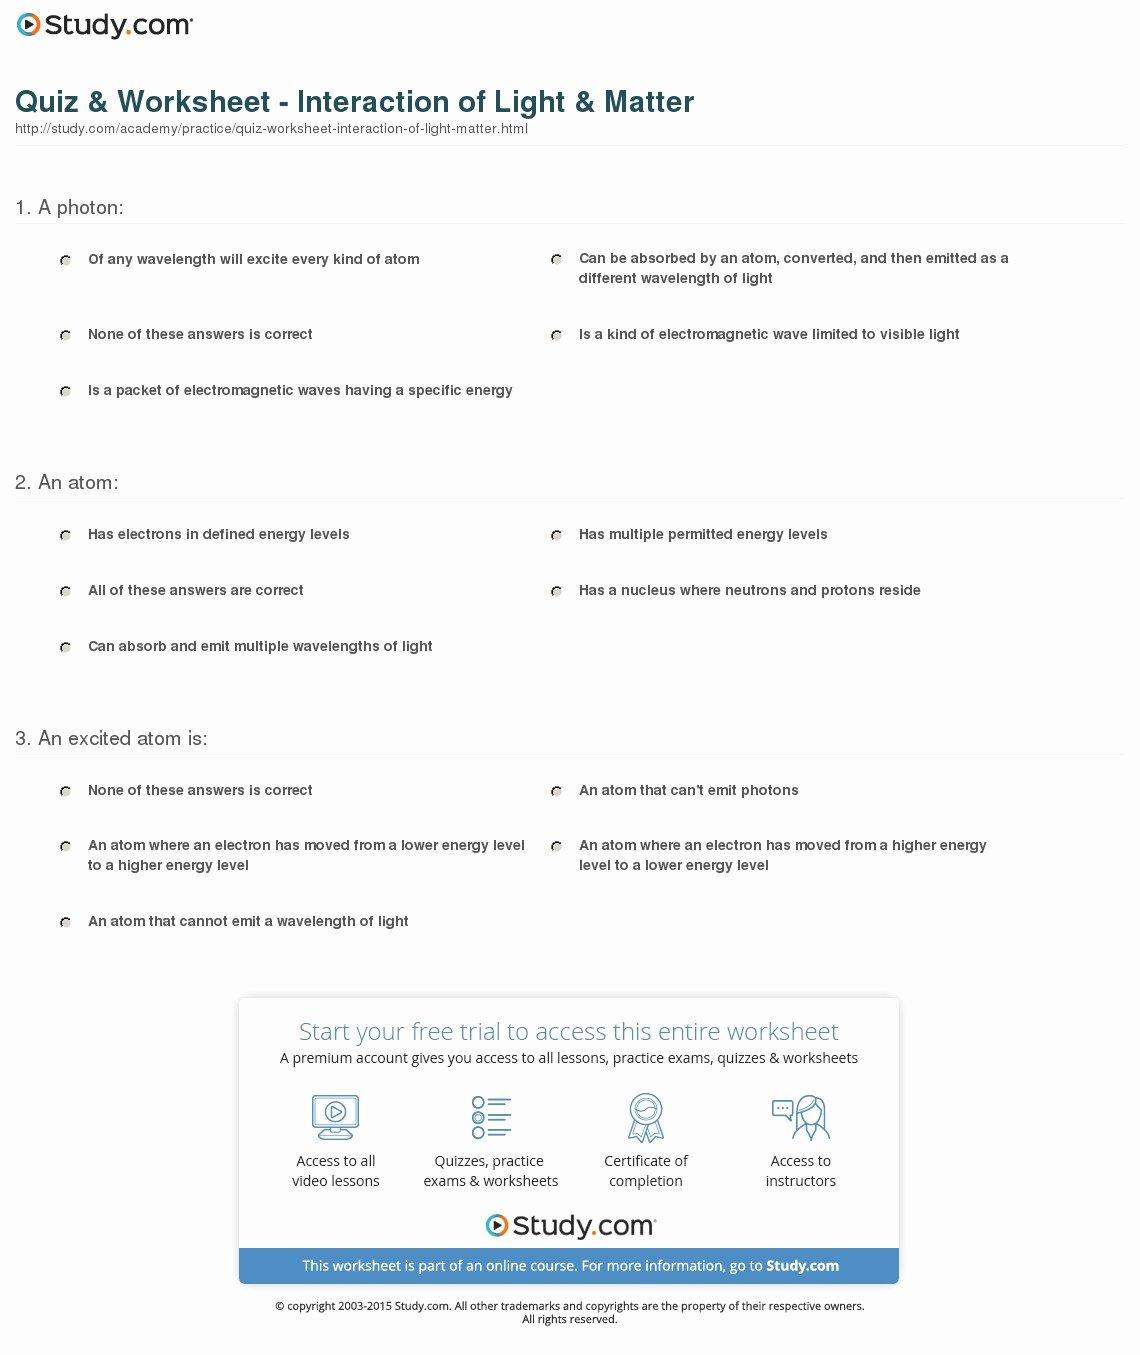 quiz worksheet interaction of light matter